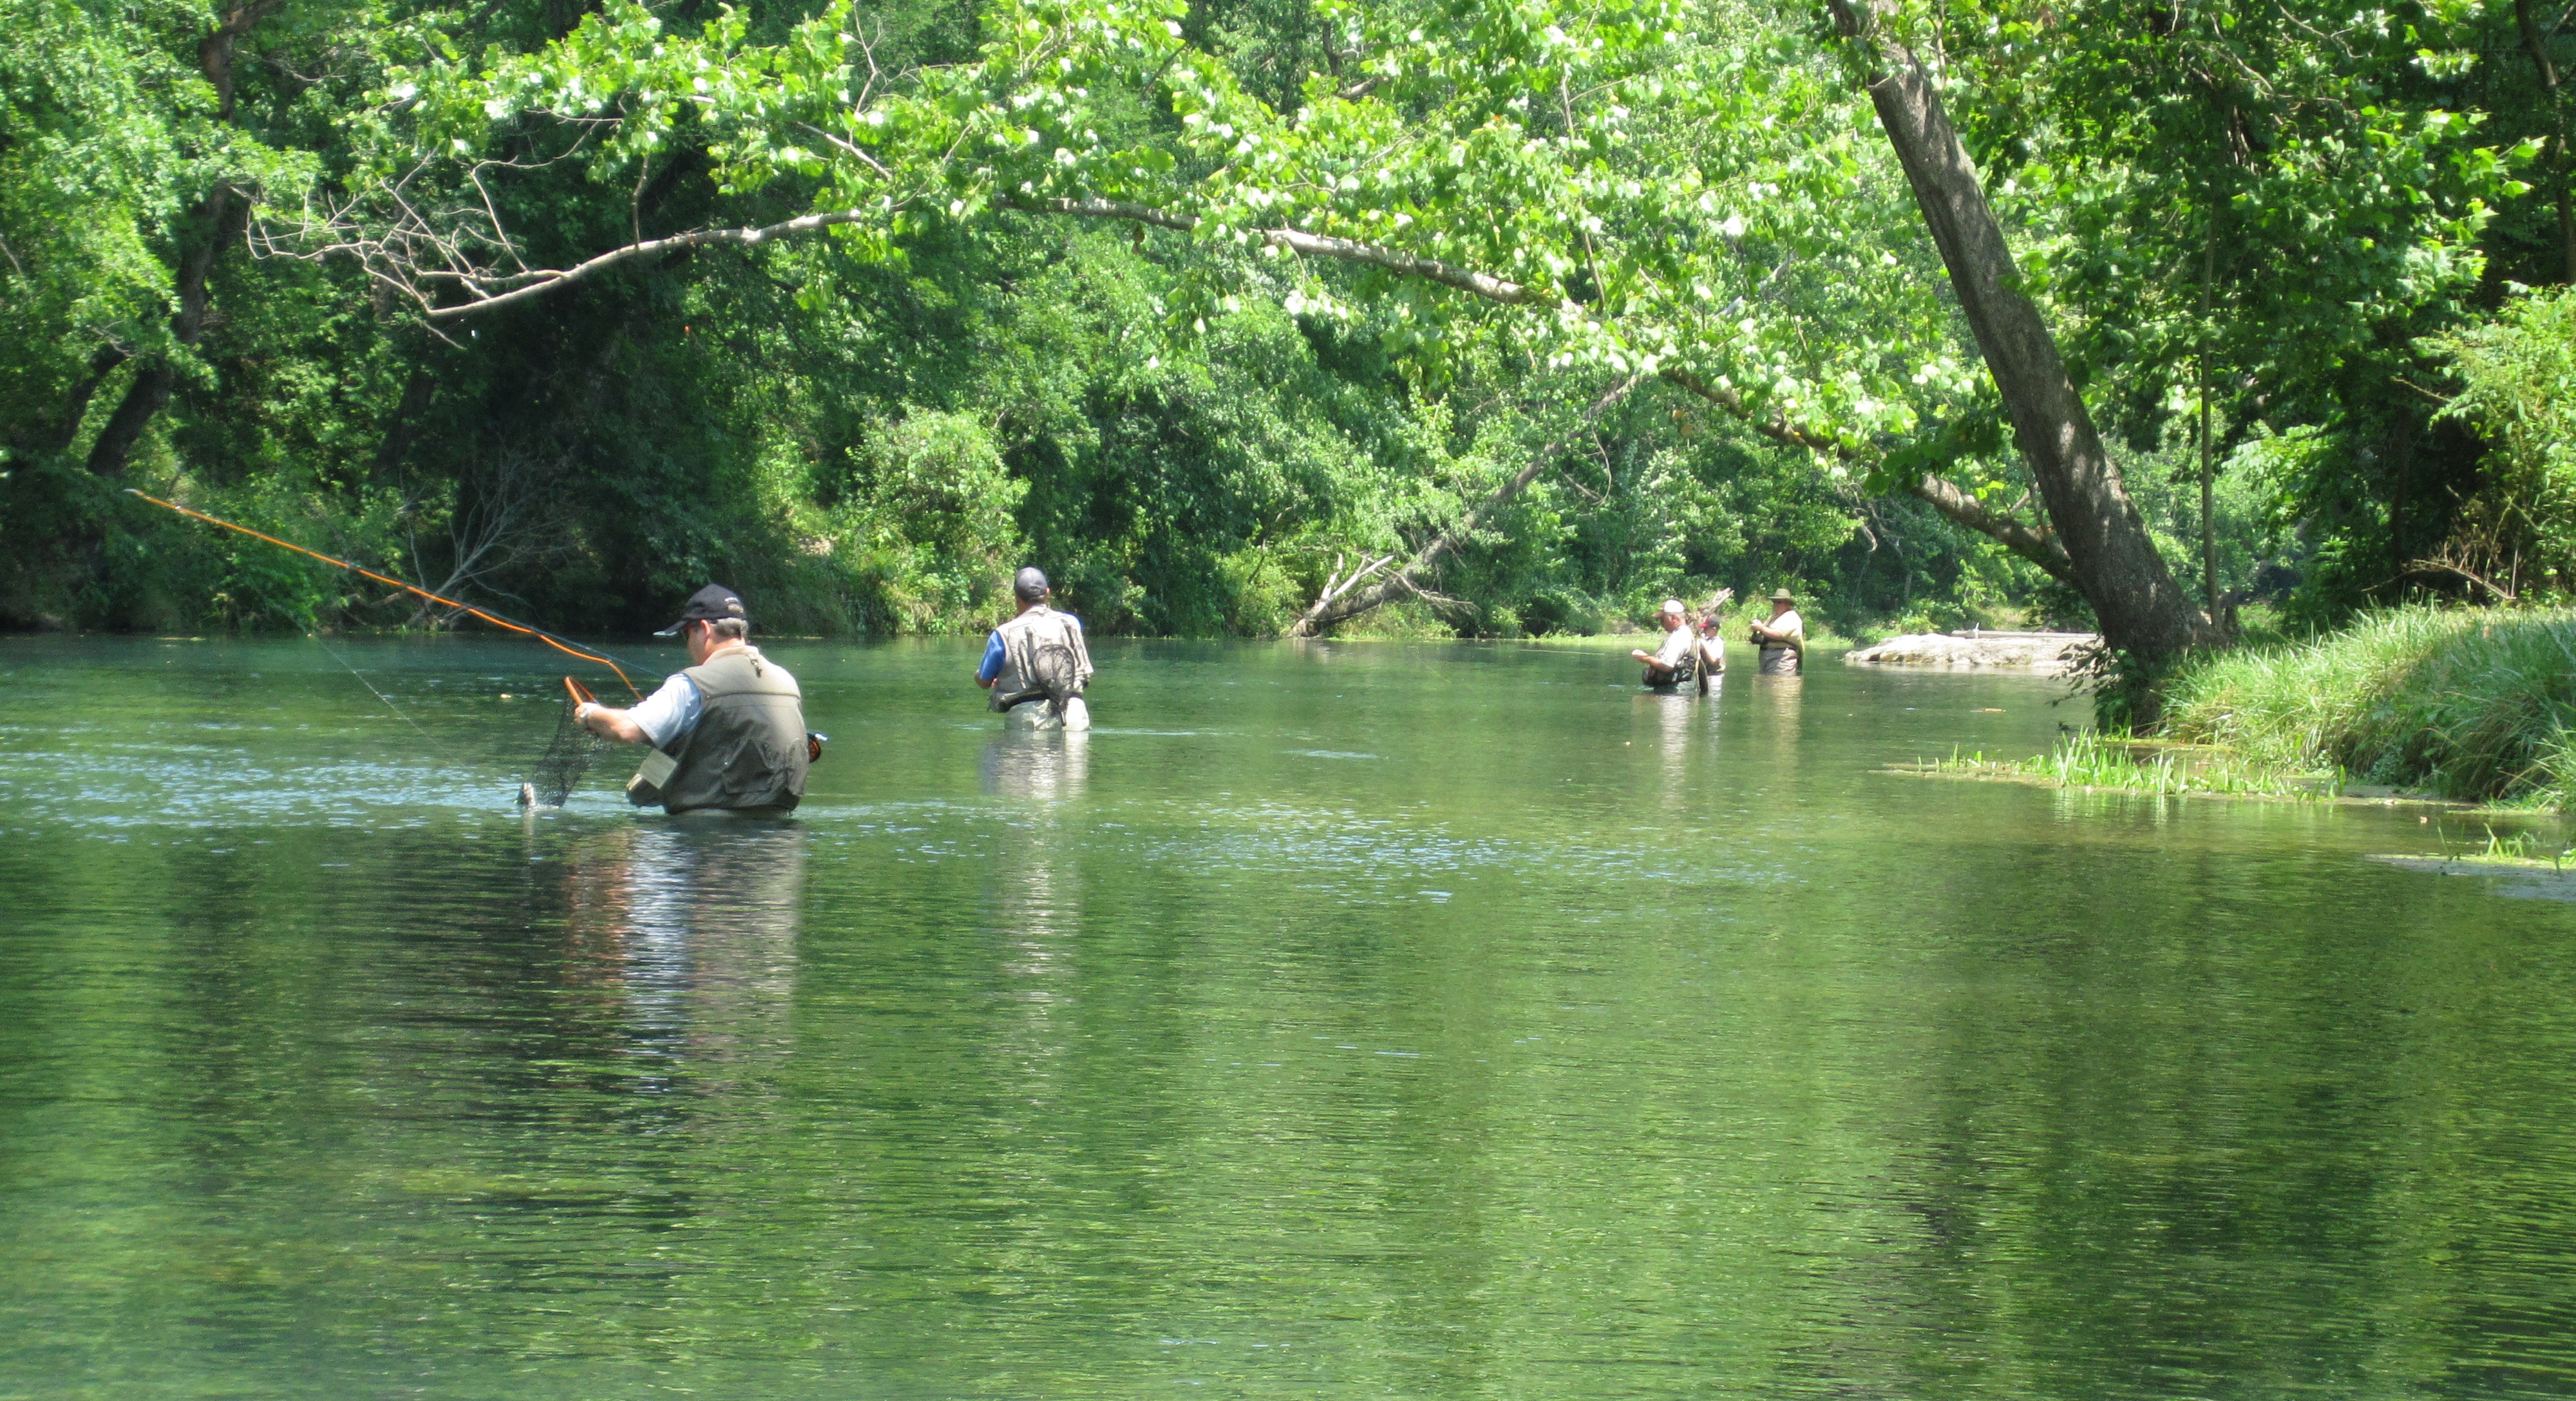 Trout park fishing bennett spring version base camp for Bennett springs trout fishing